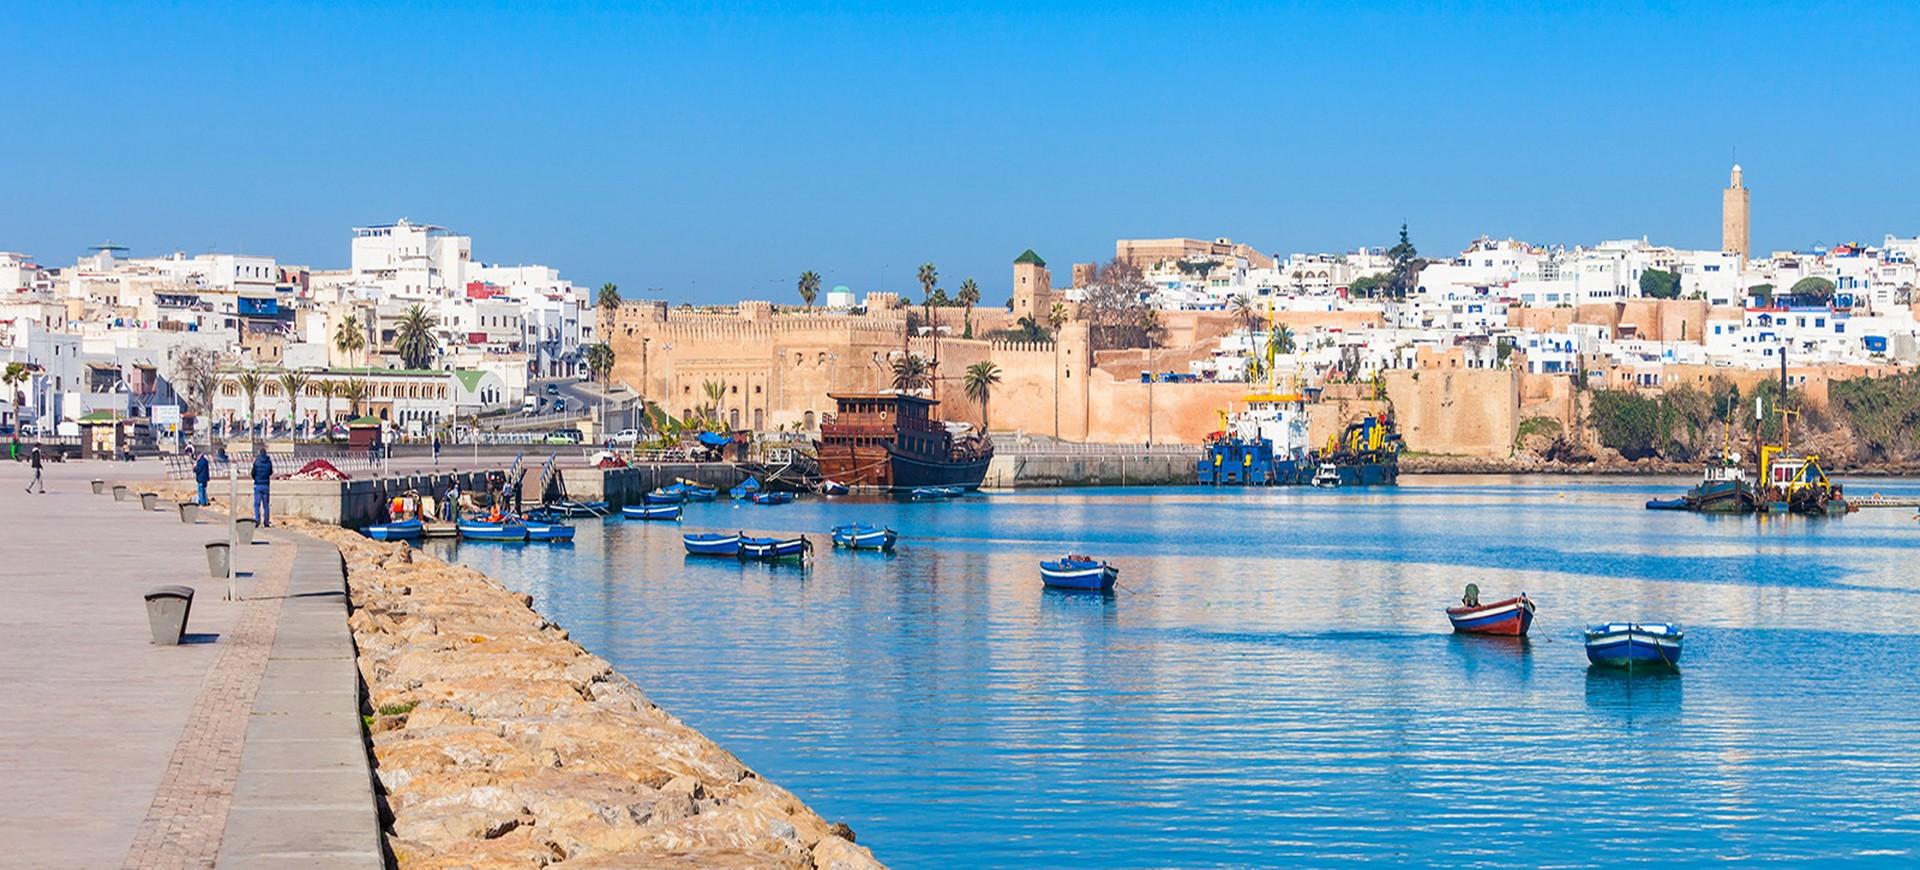 Port à Rabat au Maroc